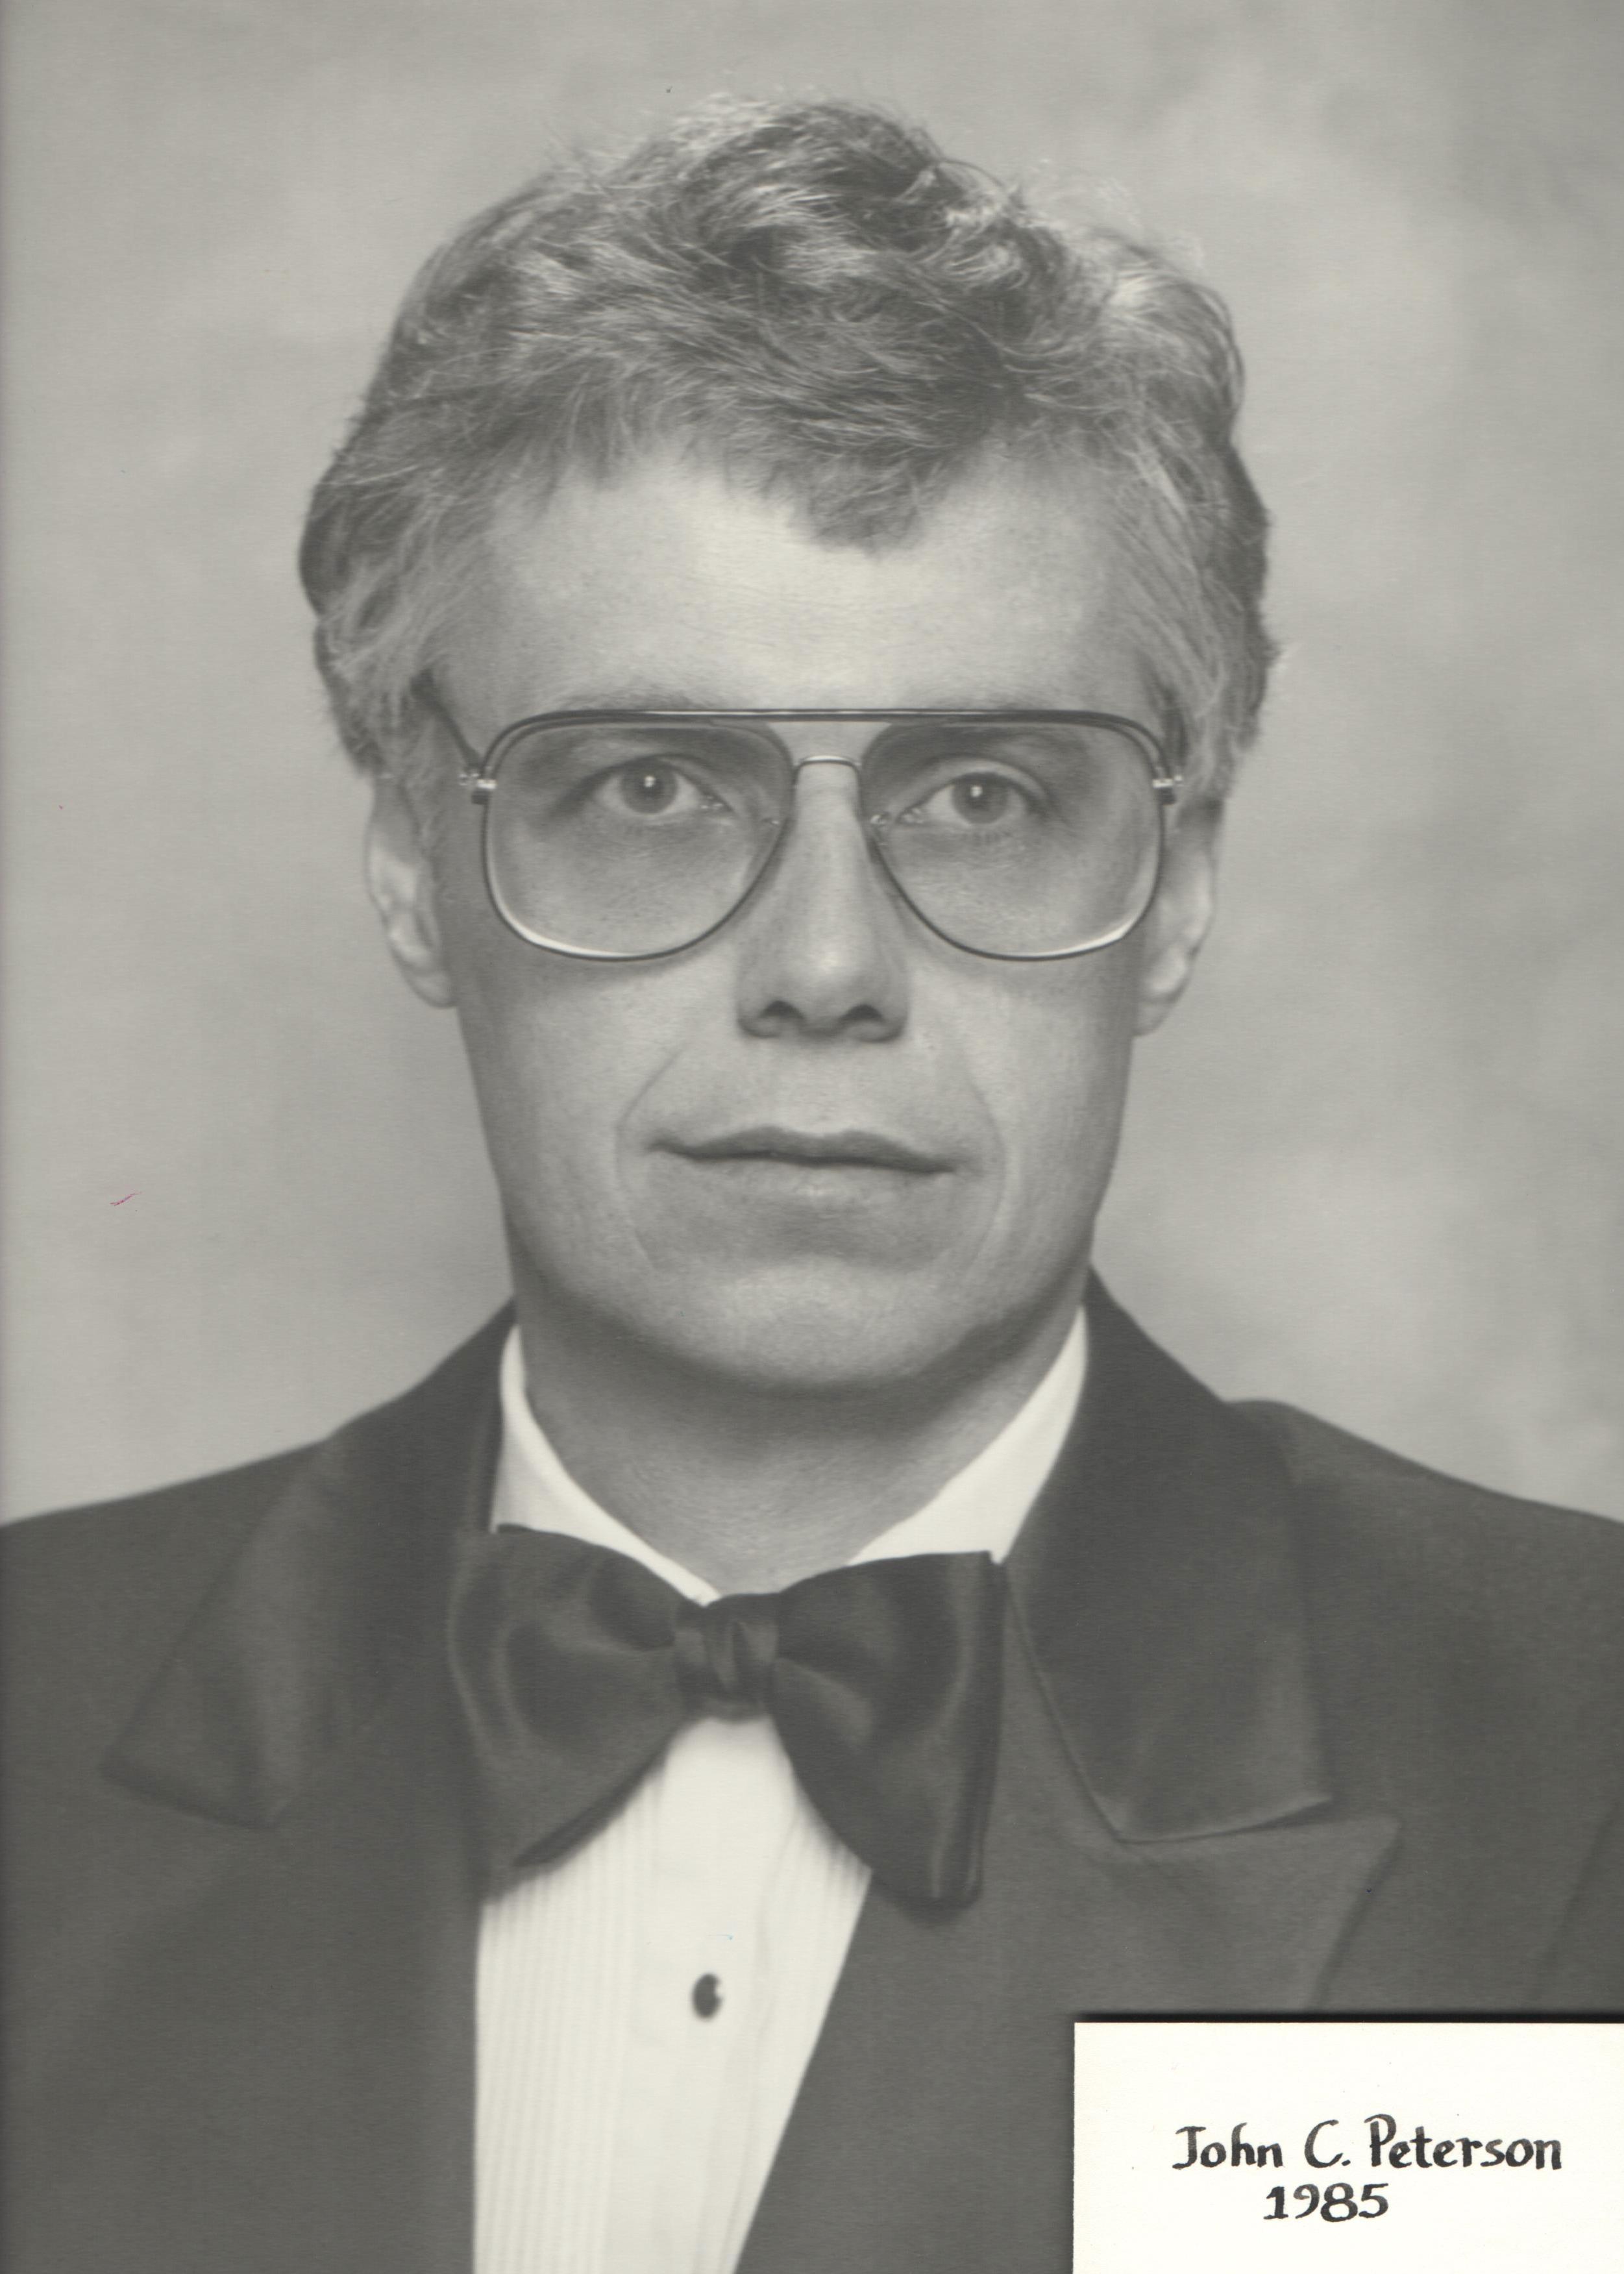 1985 John C. Peterson